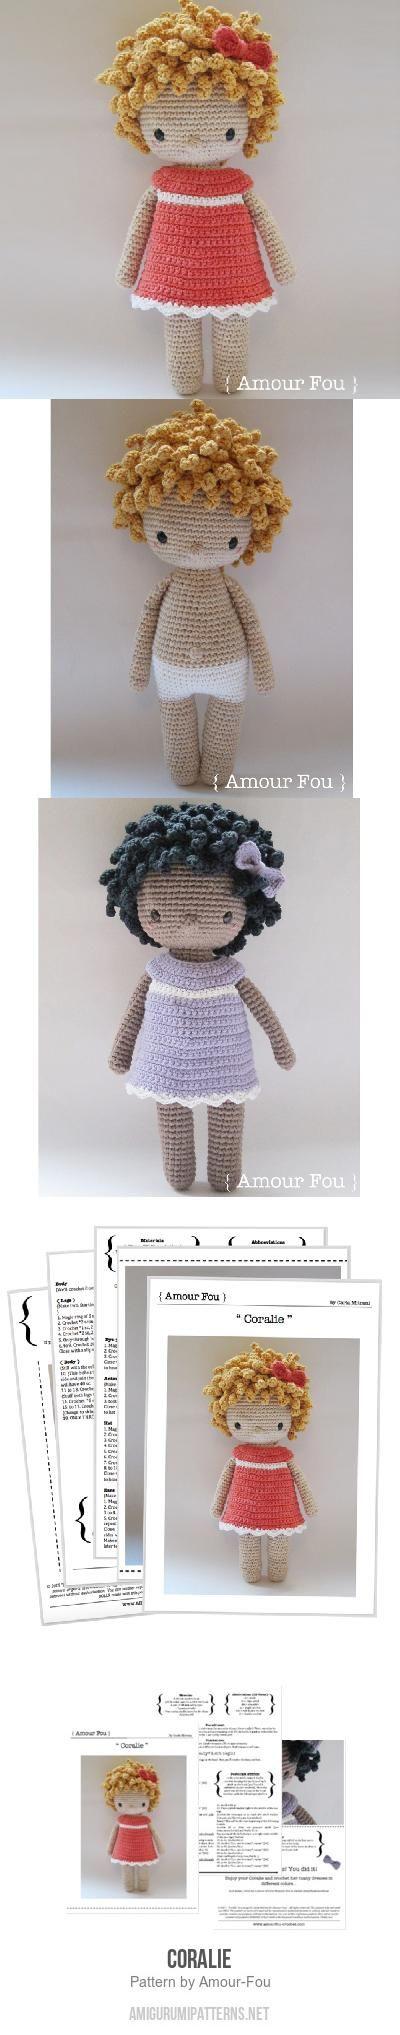 Coralie amigurumi pattern | Violet en 2018 | Pinterest | Ganchillo ...